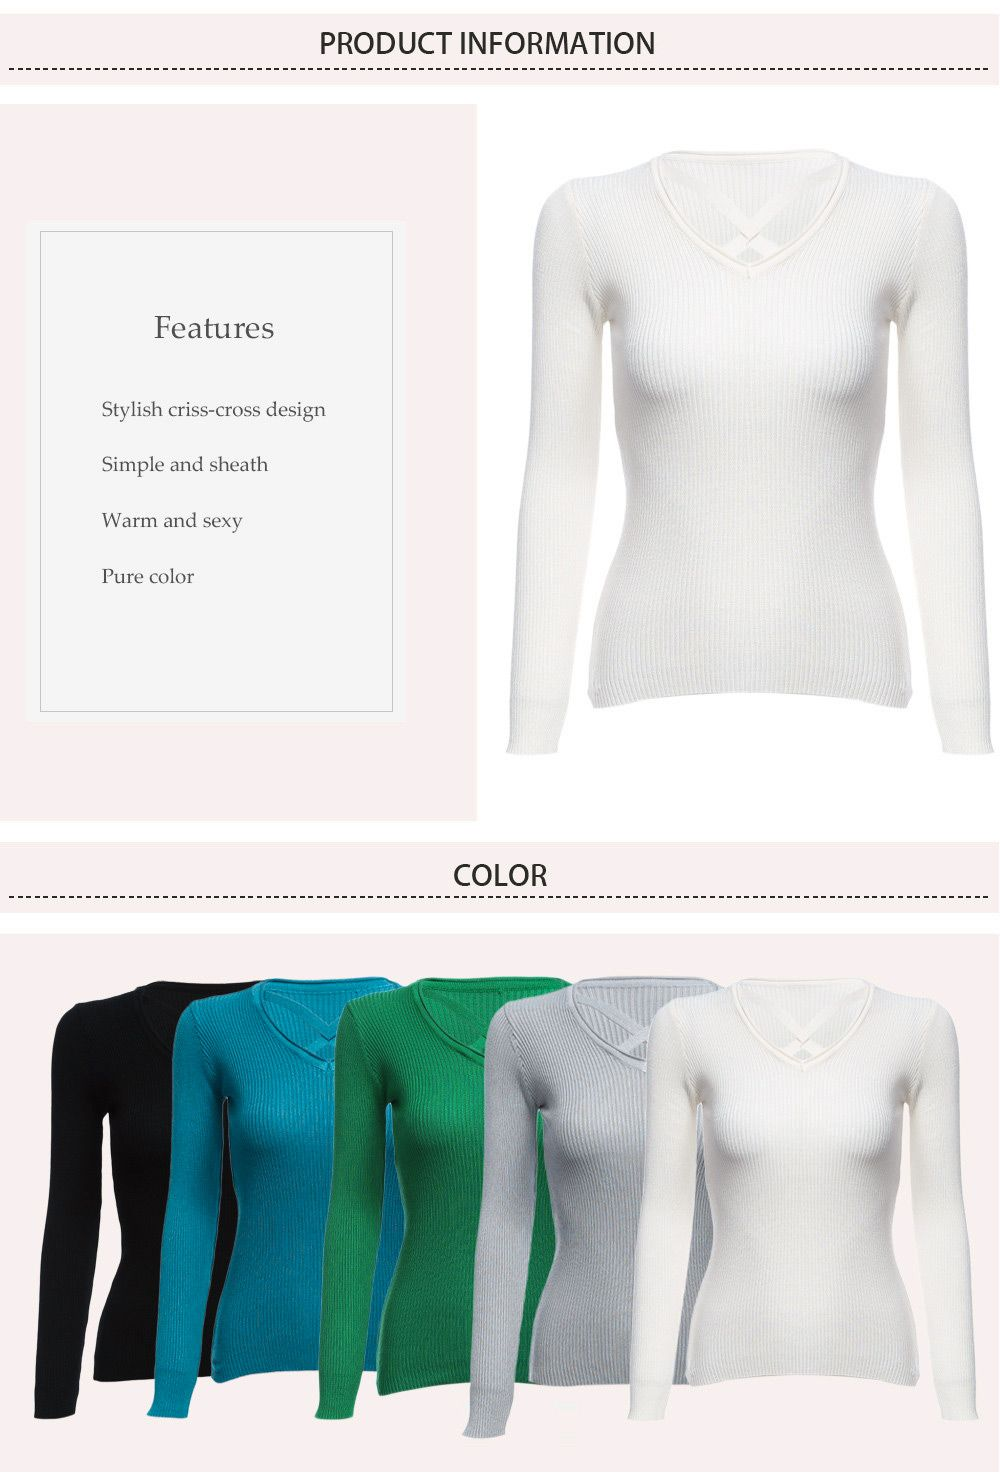 Fashion V-neck Bandage Design Long Sleeve Pure Color Sheath Women Sweater